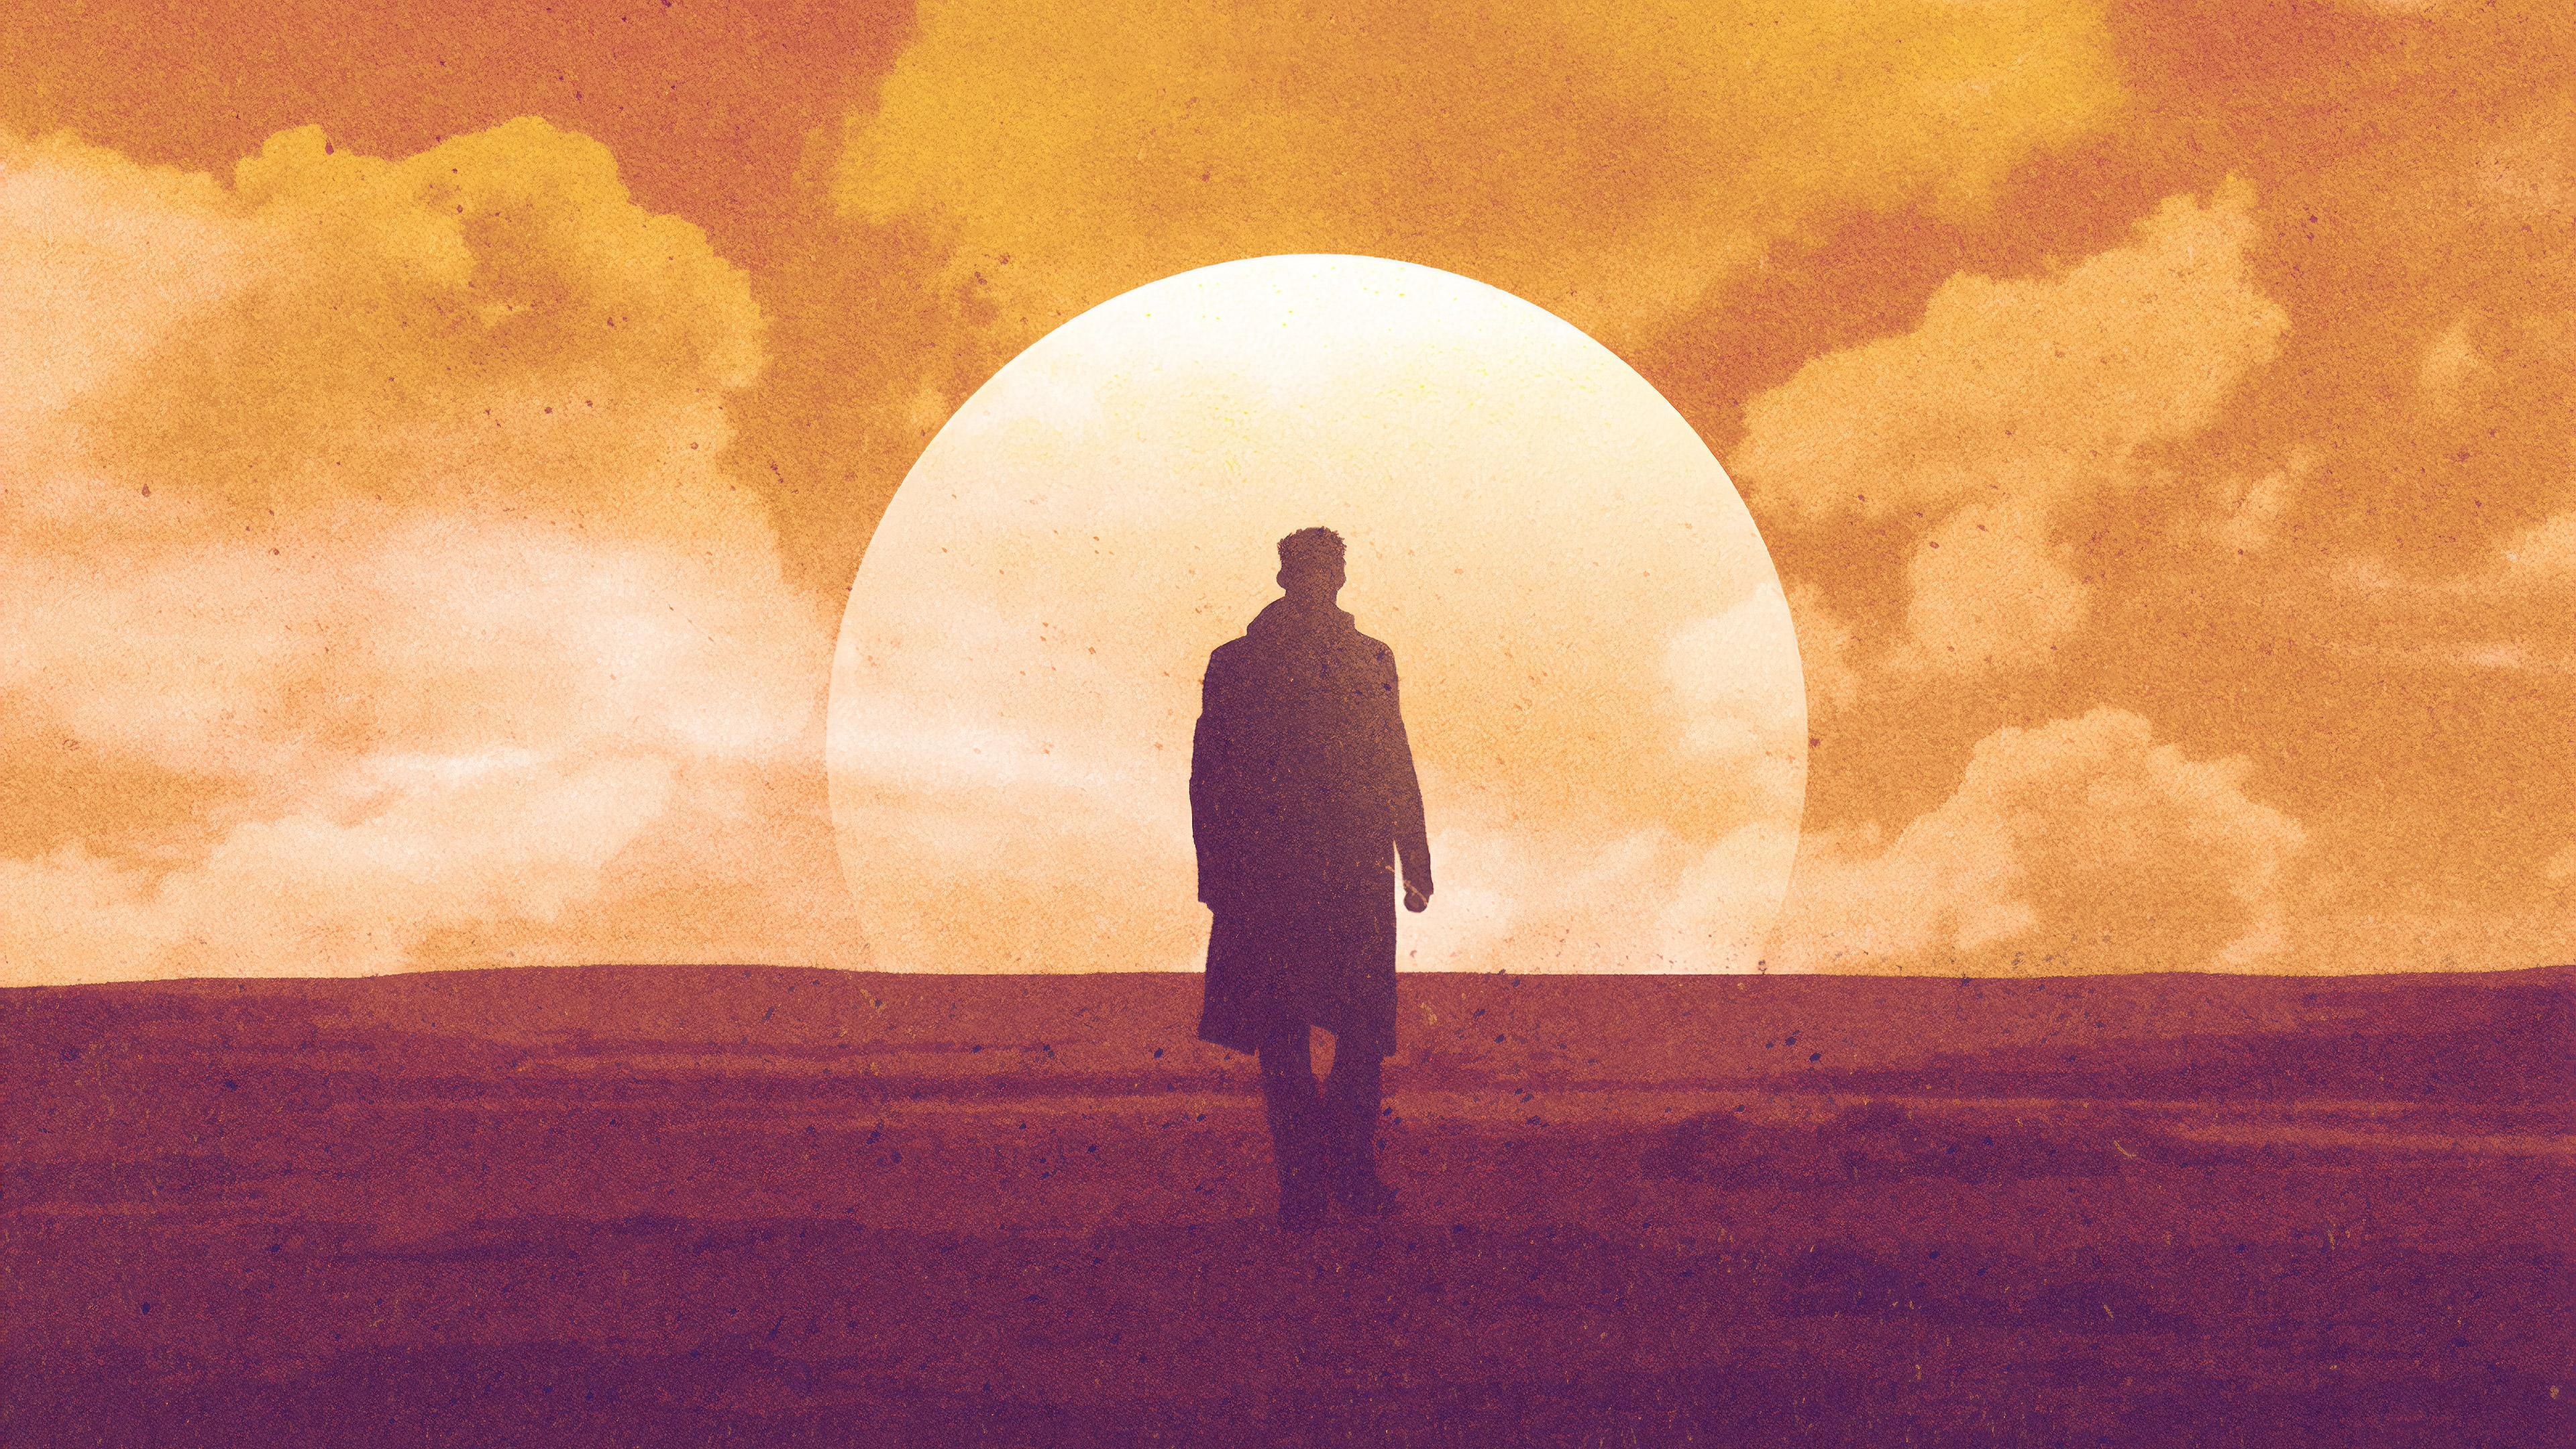 Blade Runner 2049 Art 4k Hd Movies 4k Wallpapers Images